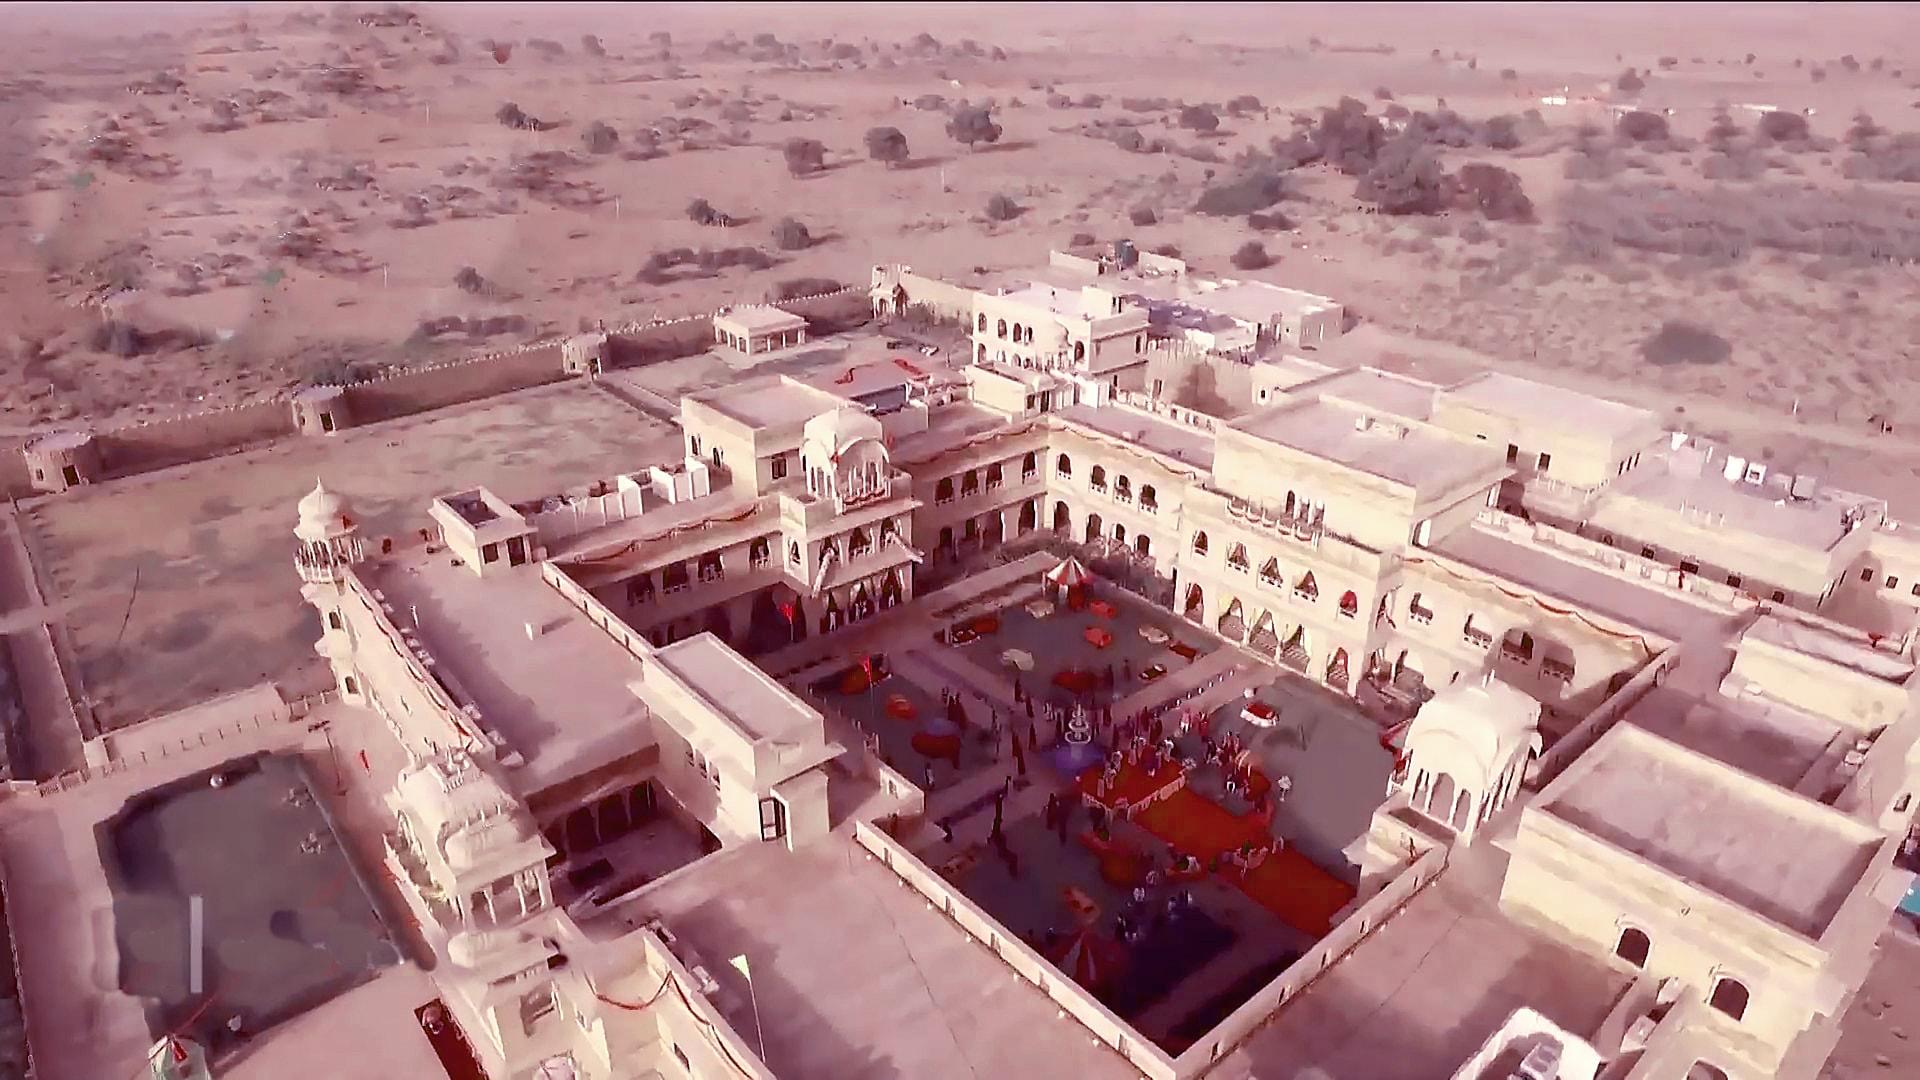 Jaisalmer tourism